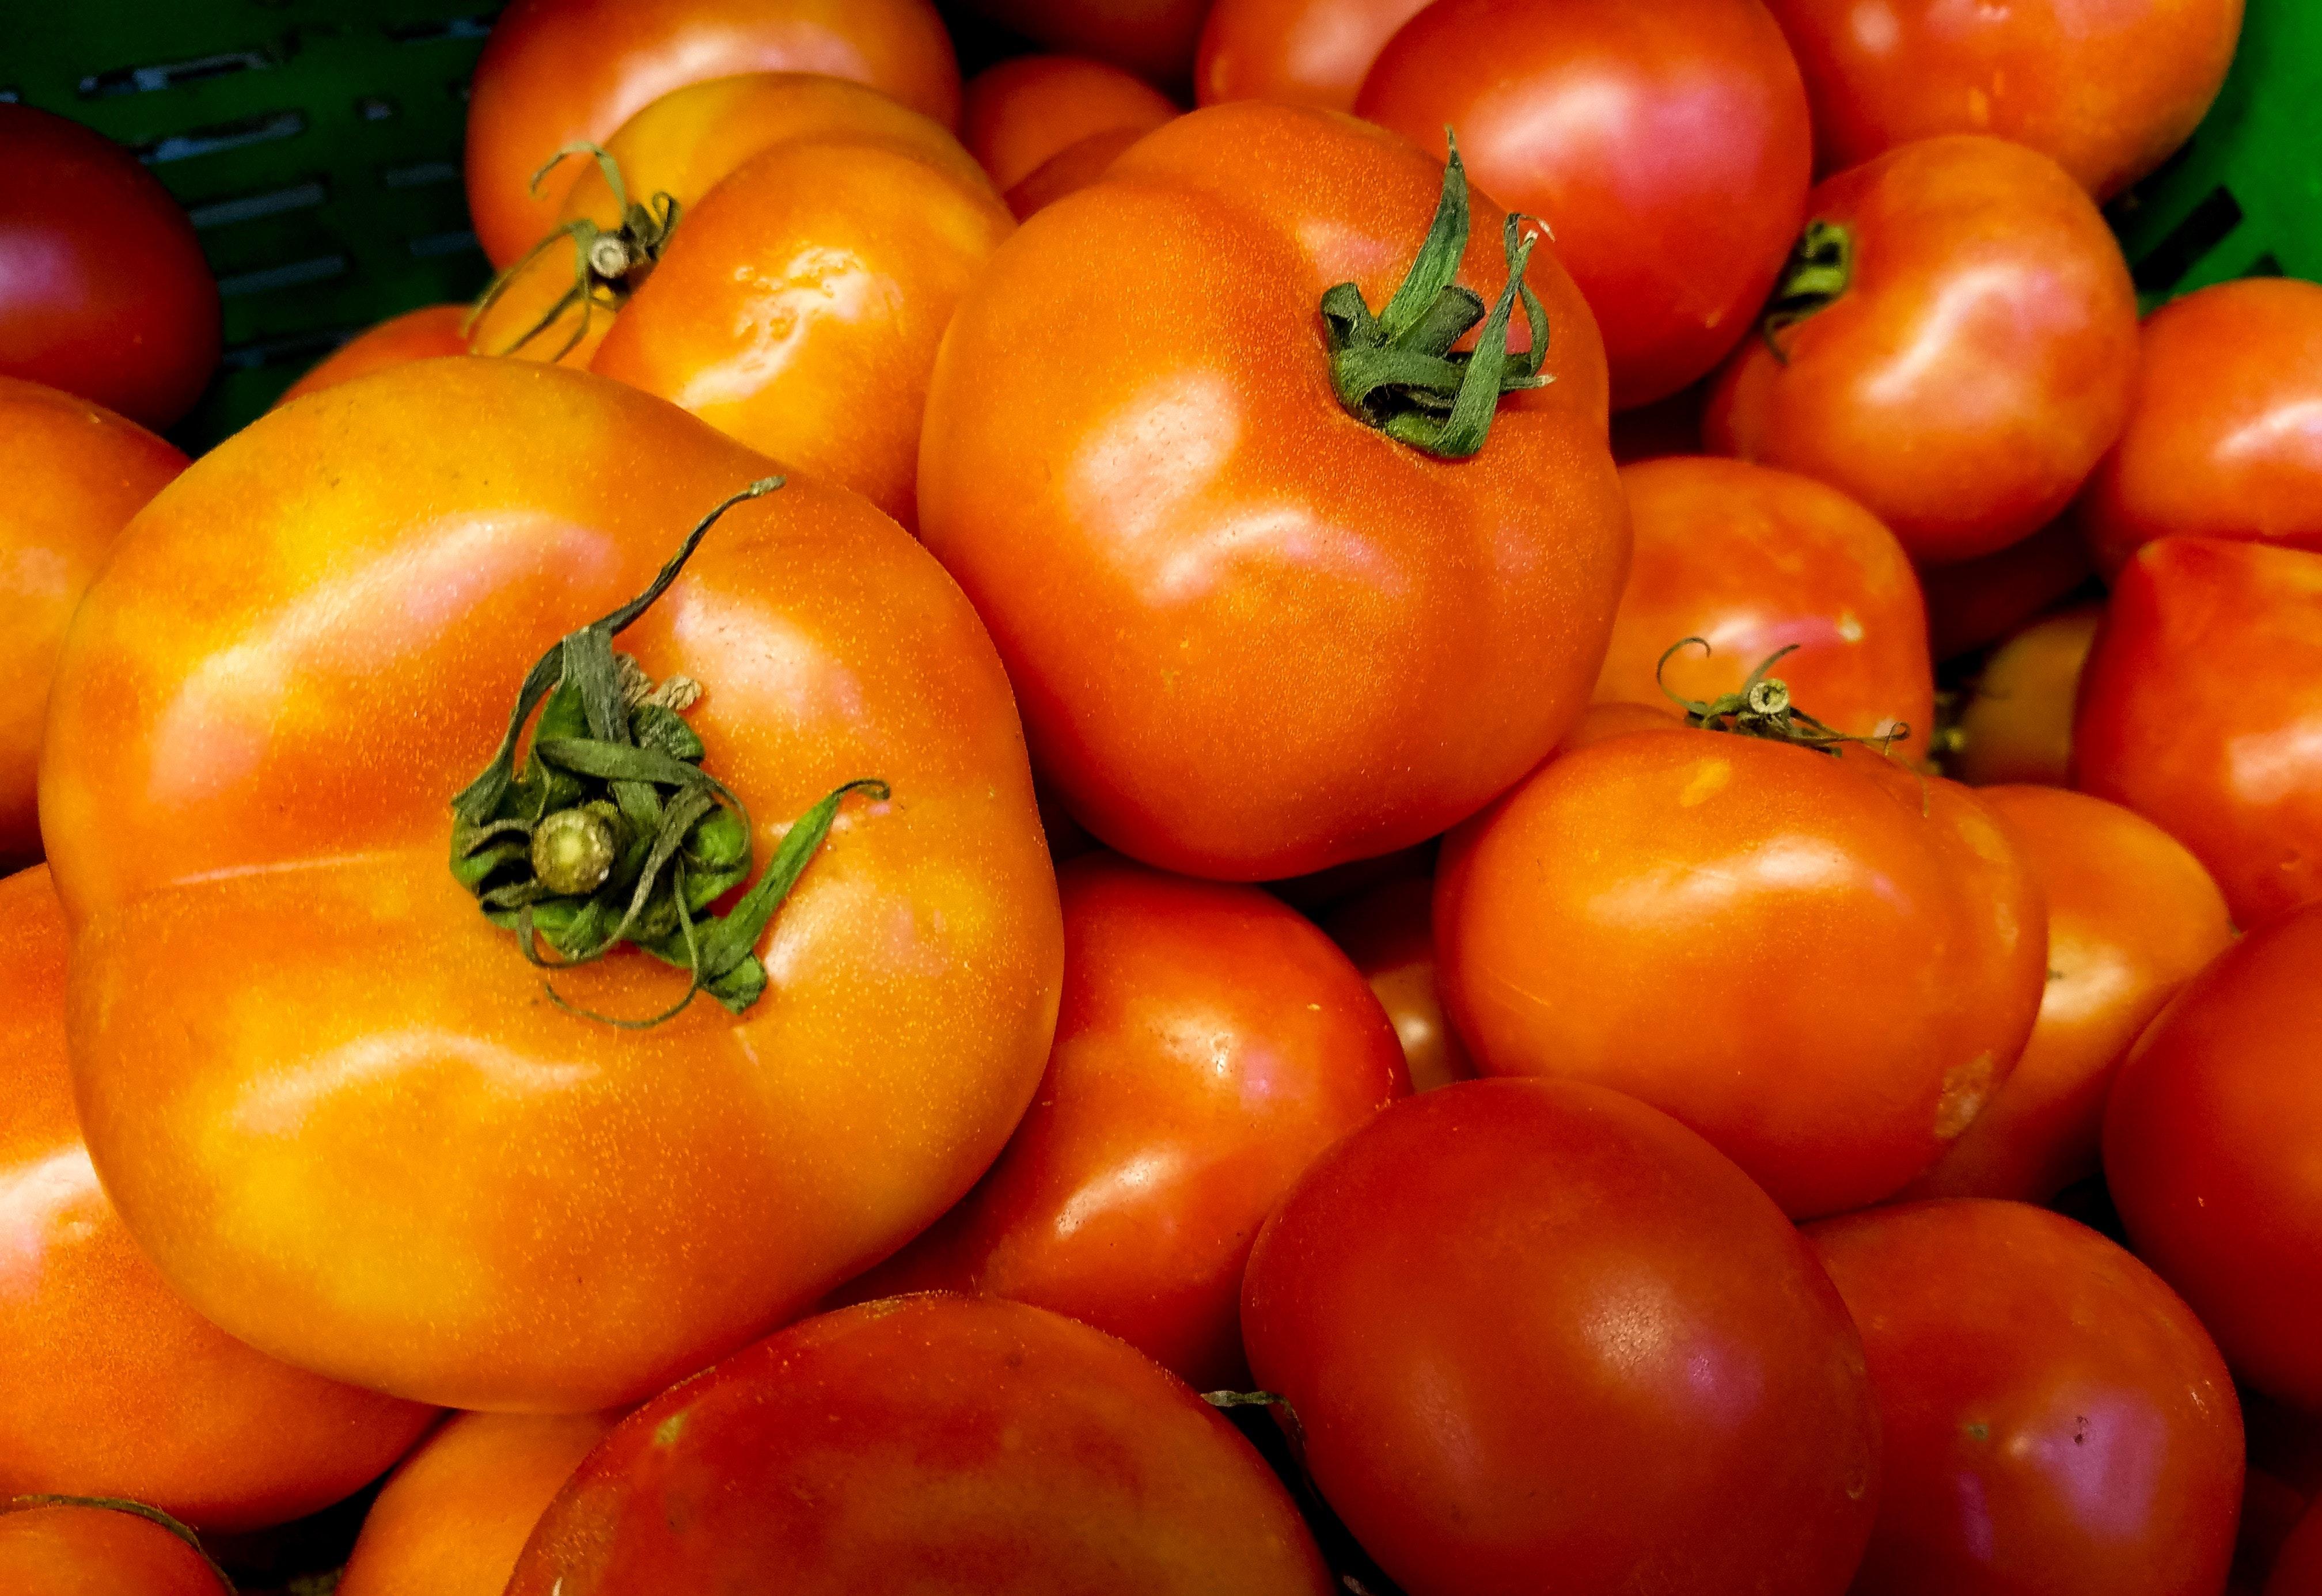 "Large ripe tomatoes"" width="